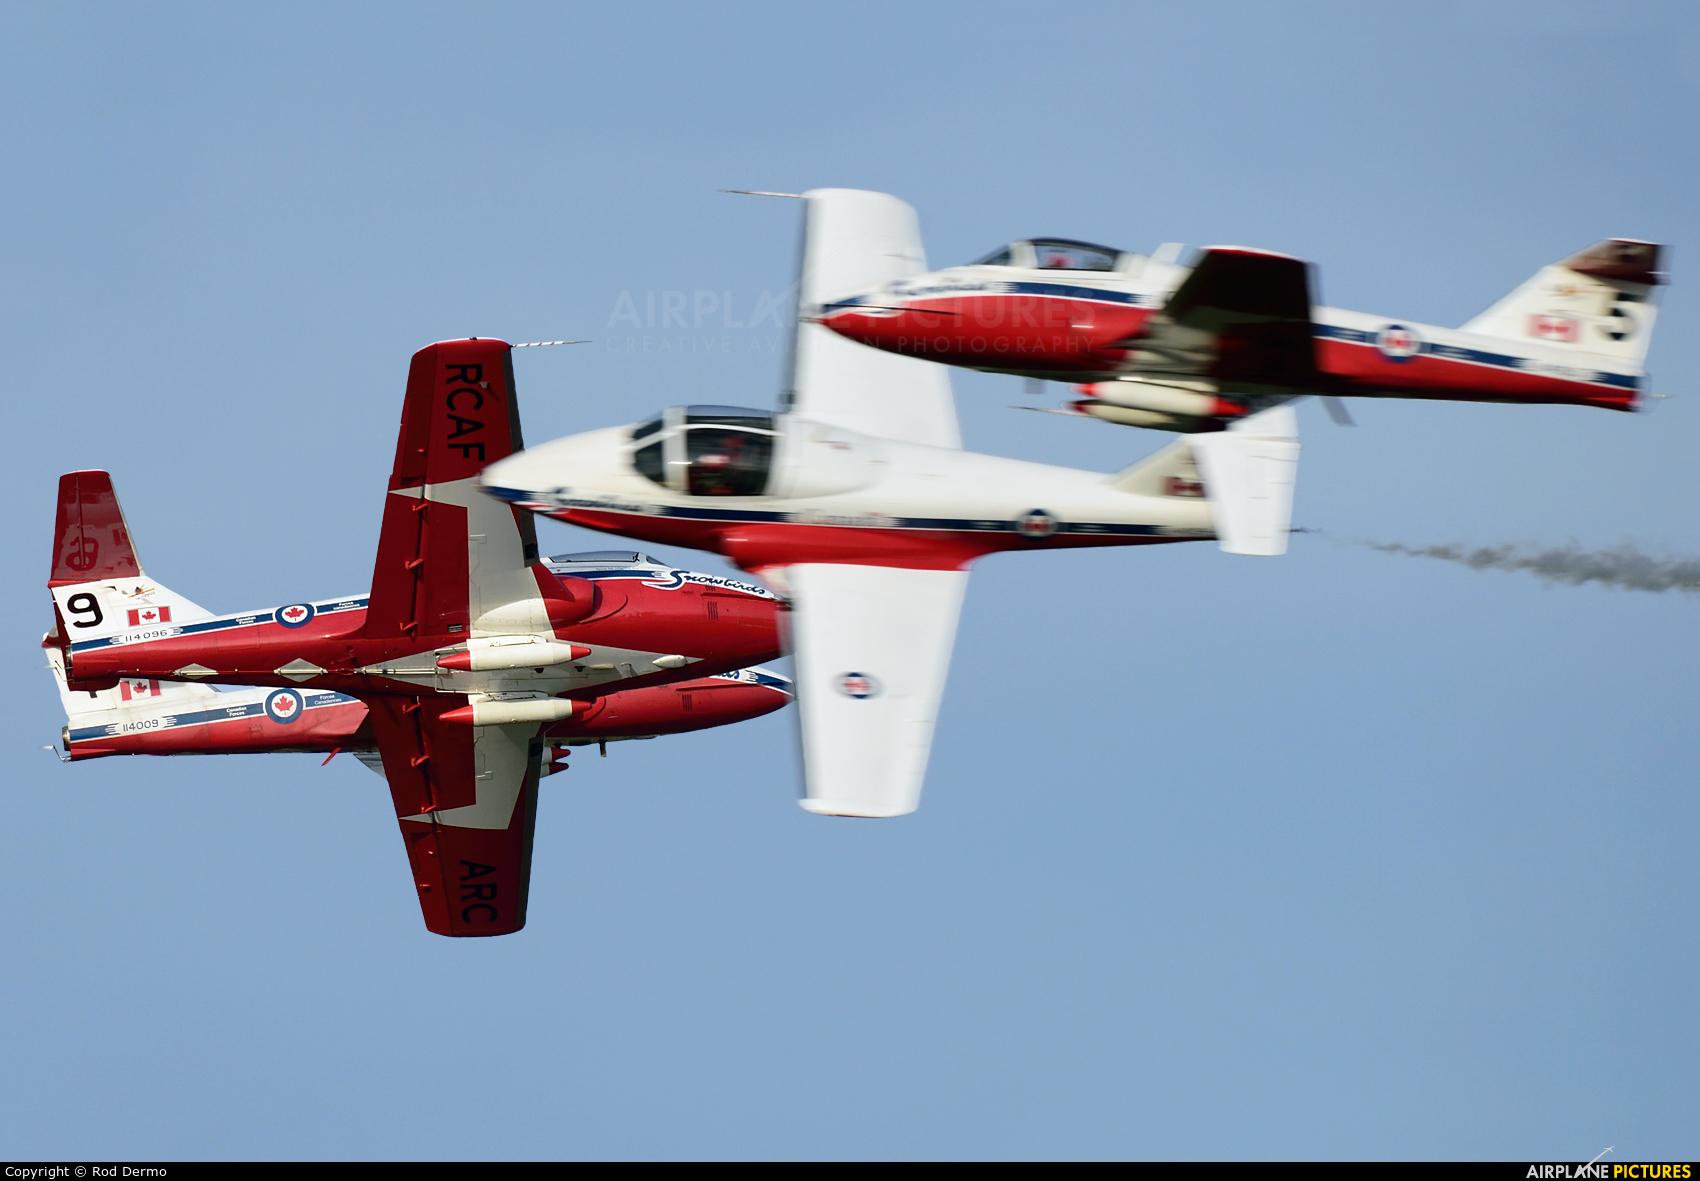 Canada - Air Force 114096 aircraft at London  Intl, ON